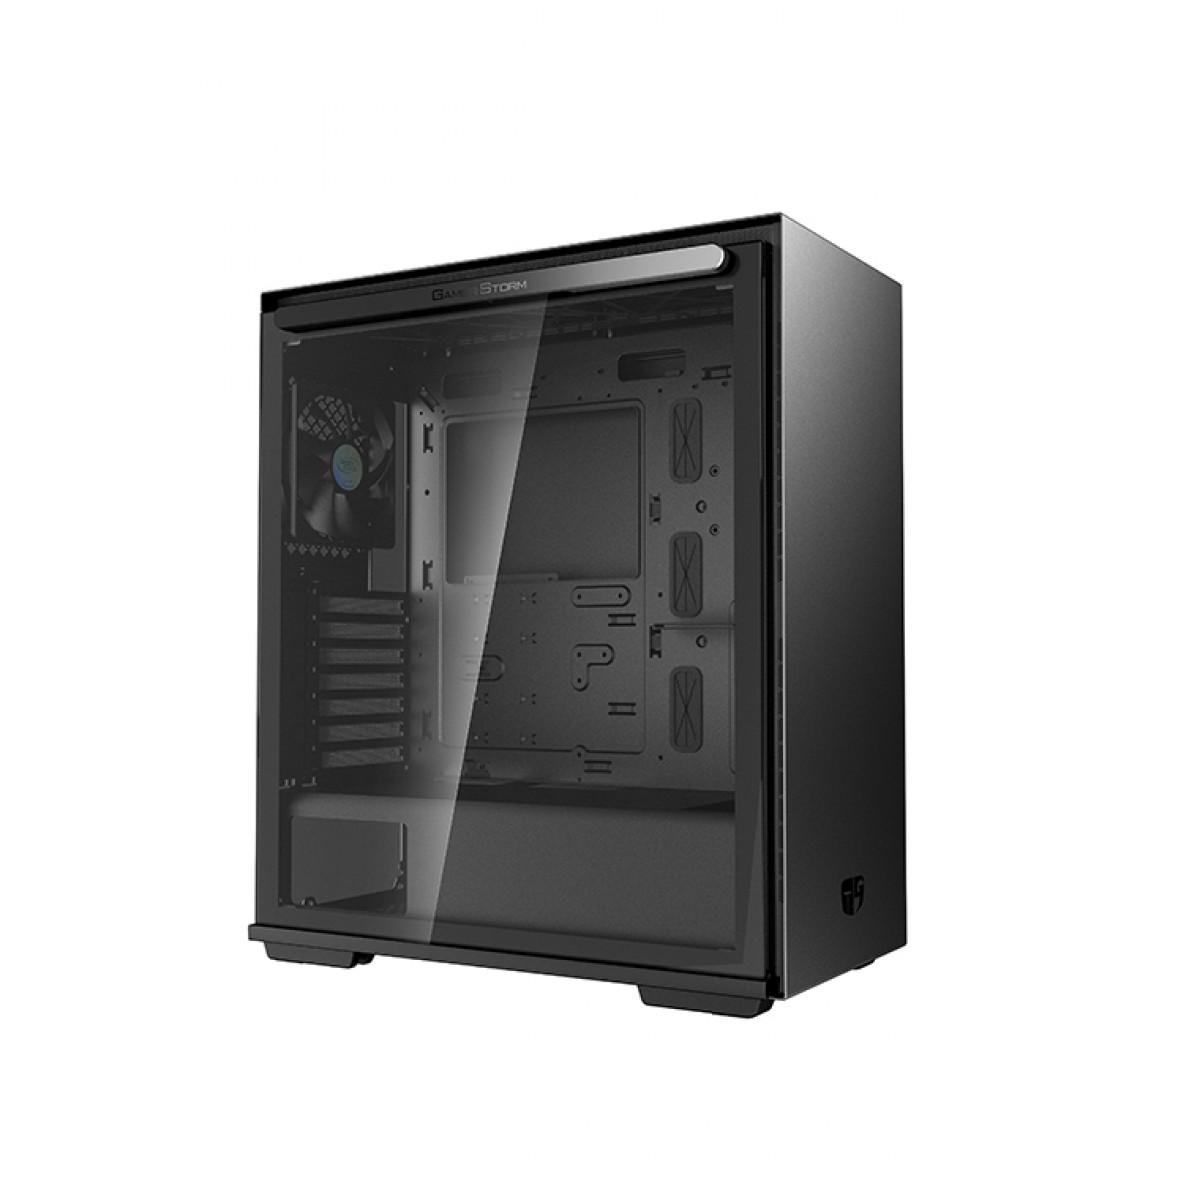 Gabinete Gamer DeepCool Macube 310P, Mid Tower, Vidro Temperado, Black, Sem Fonte, Sem Fan, GS-ATX-MACUBE310P-BKG0P